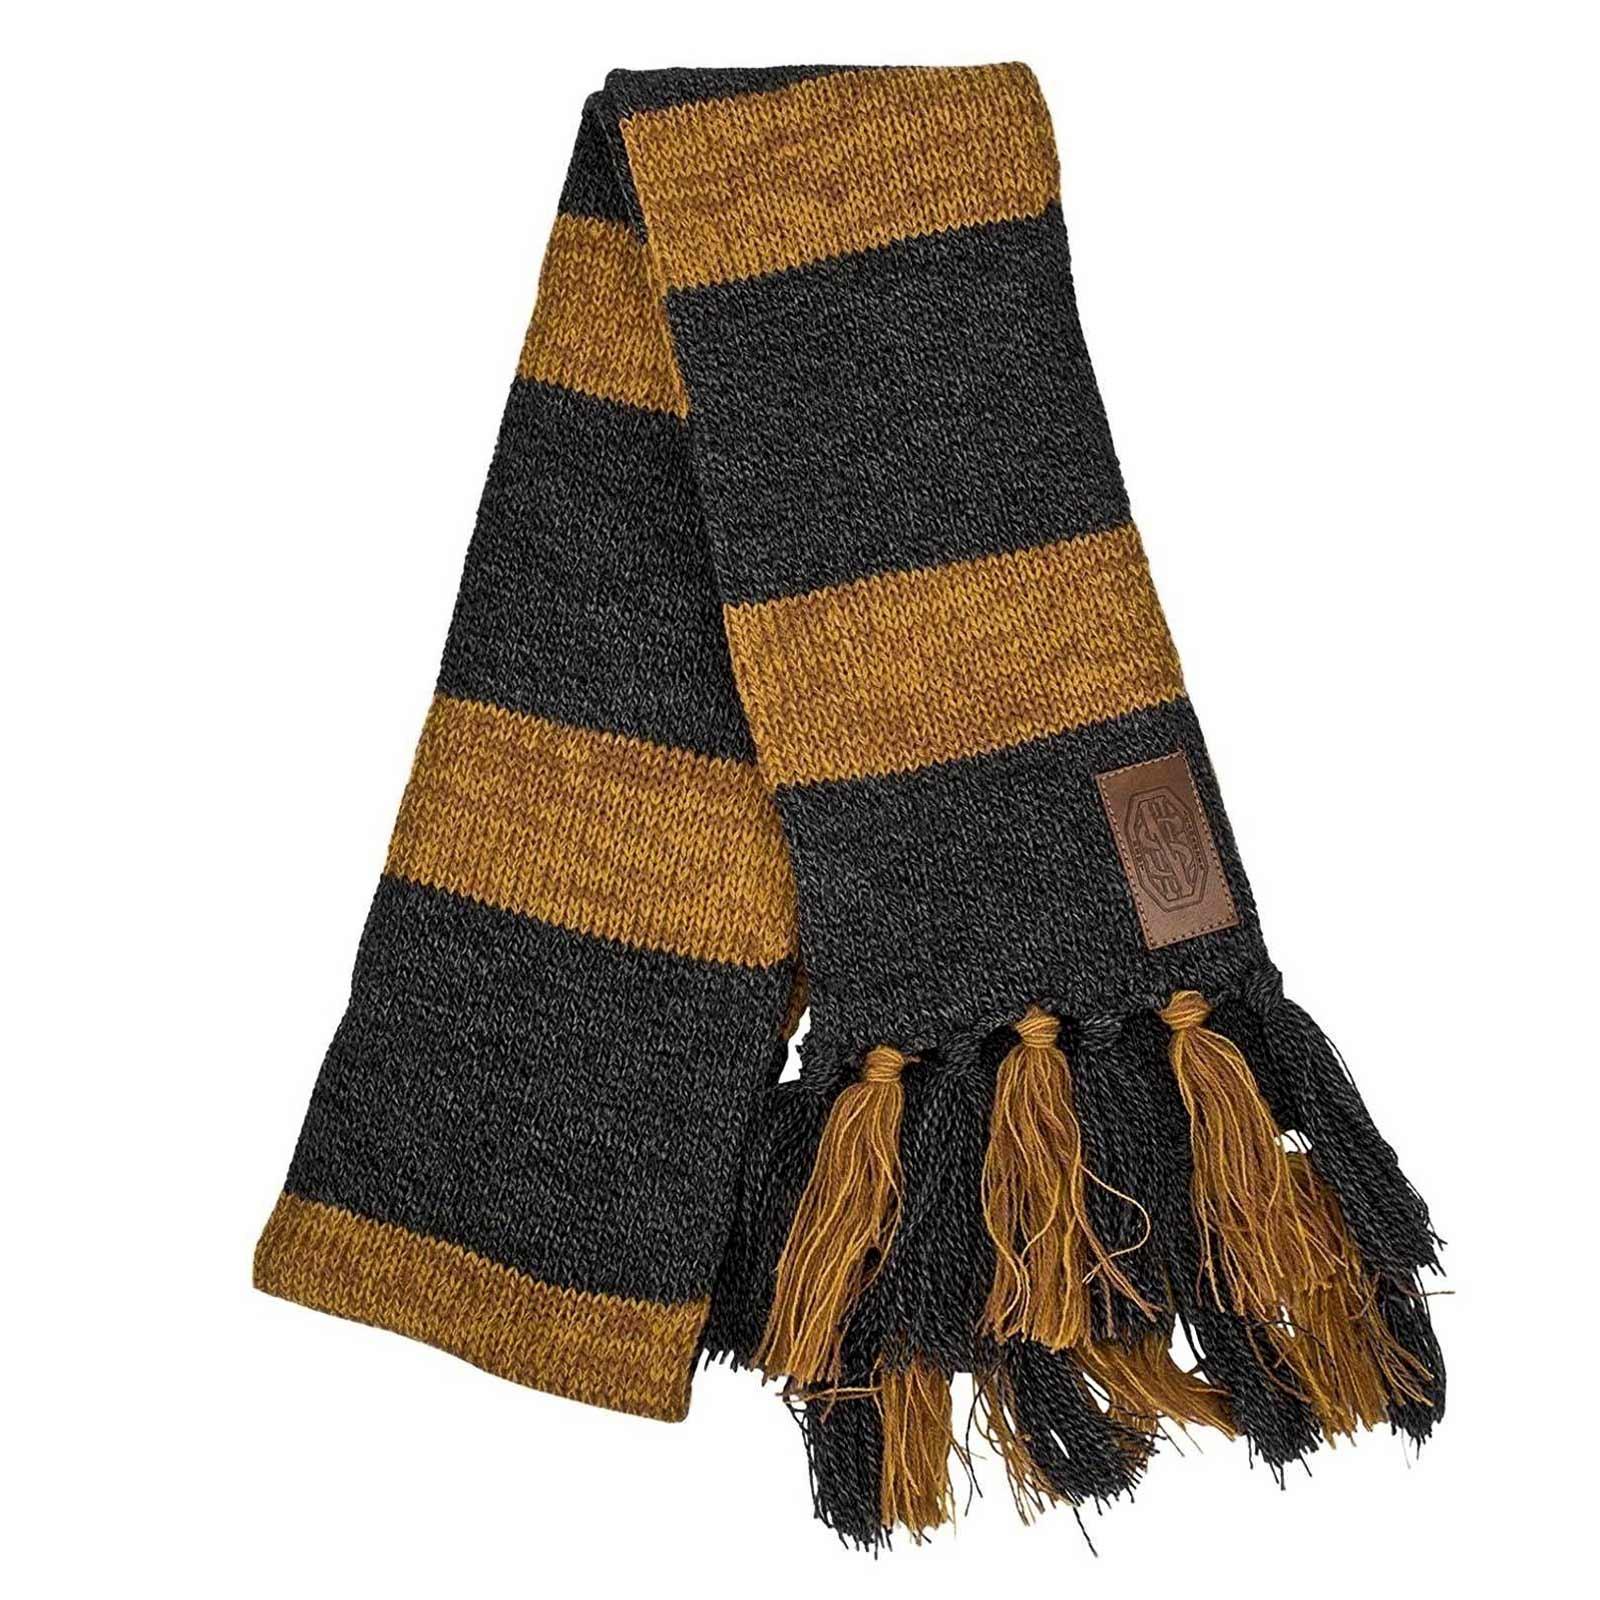 Harry Potter FANTASTIC BEASTS Newt Scamander HUFFLEPUFF Knit Scarf ...